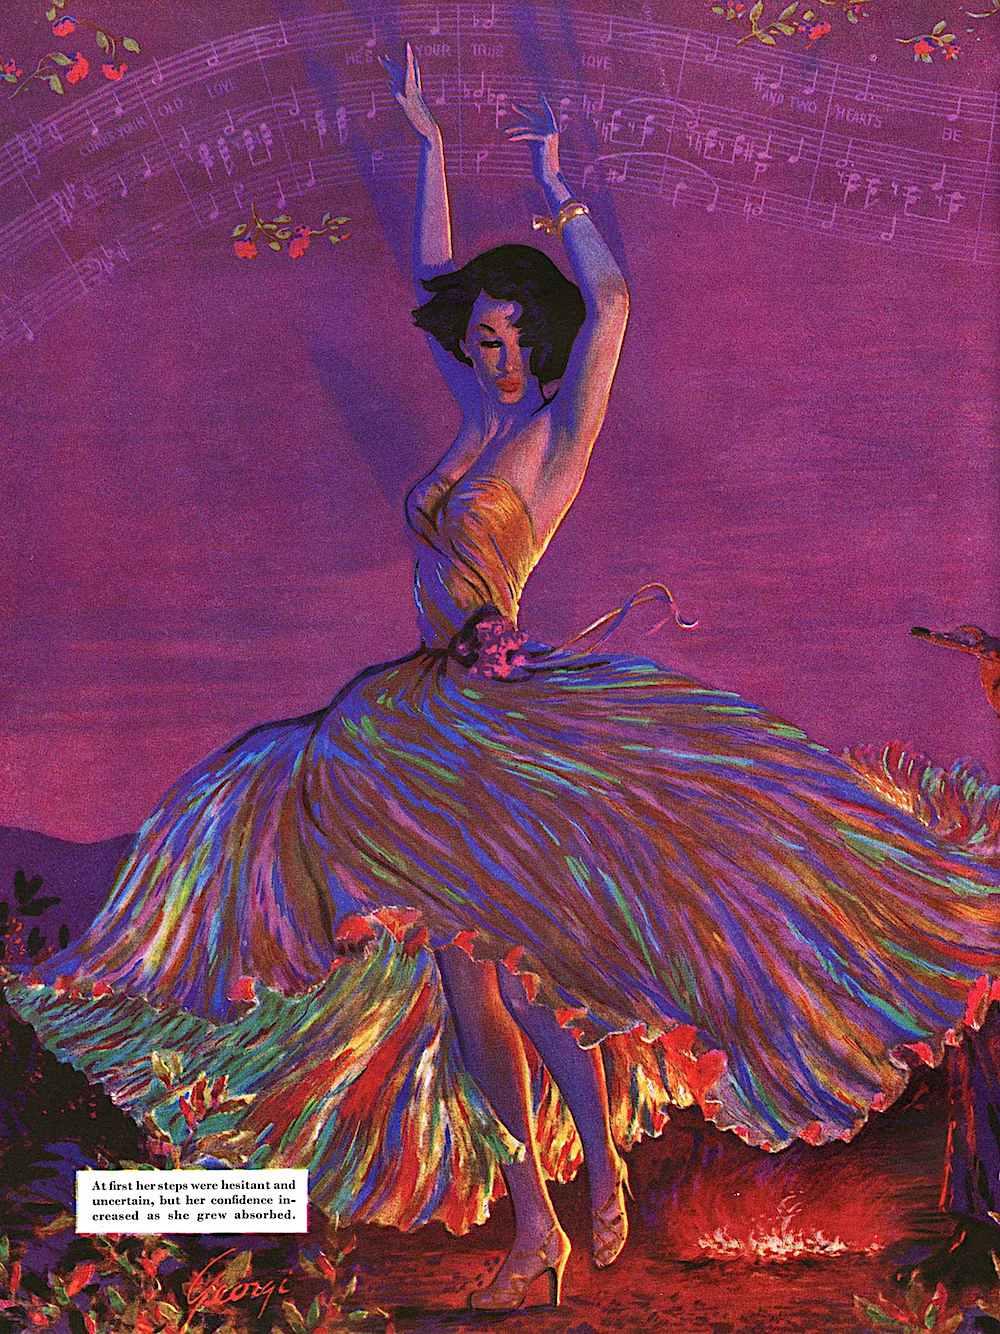 an Edwin Georgi illustration of a woman dancing with abandon around a fire